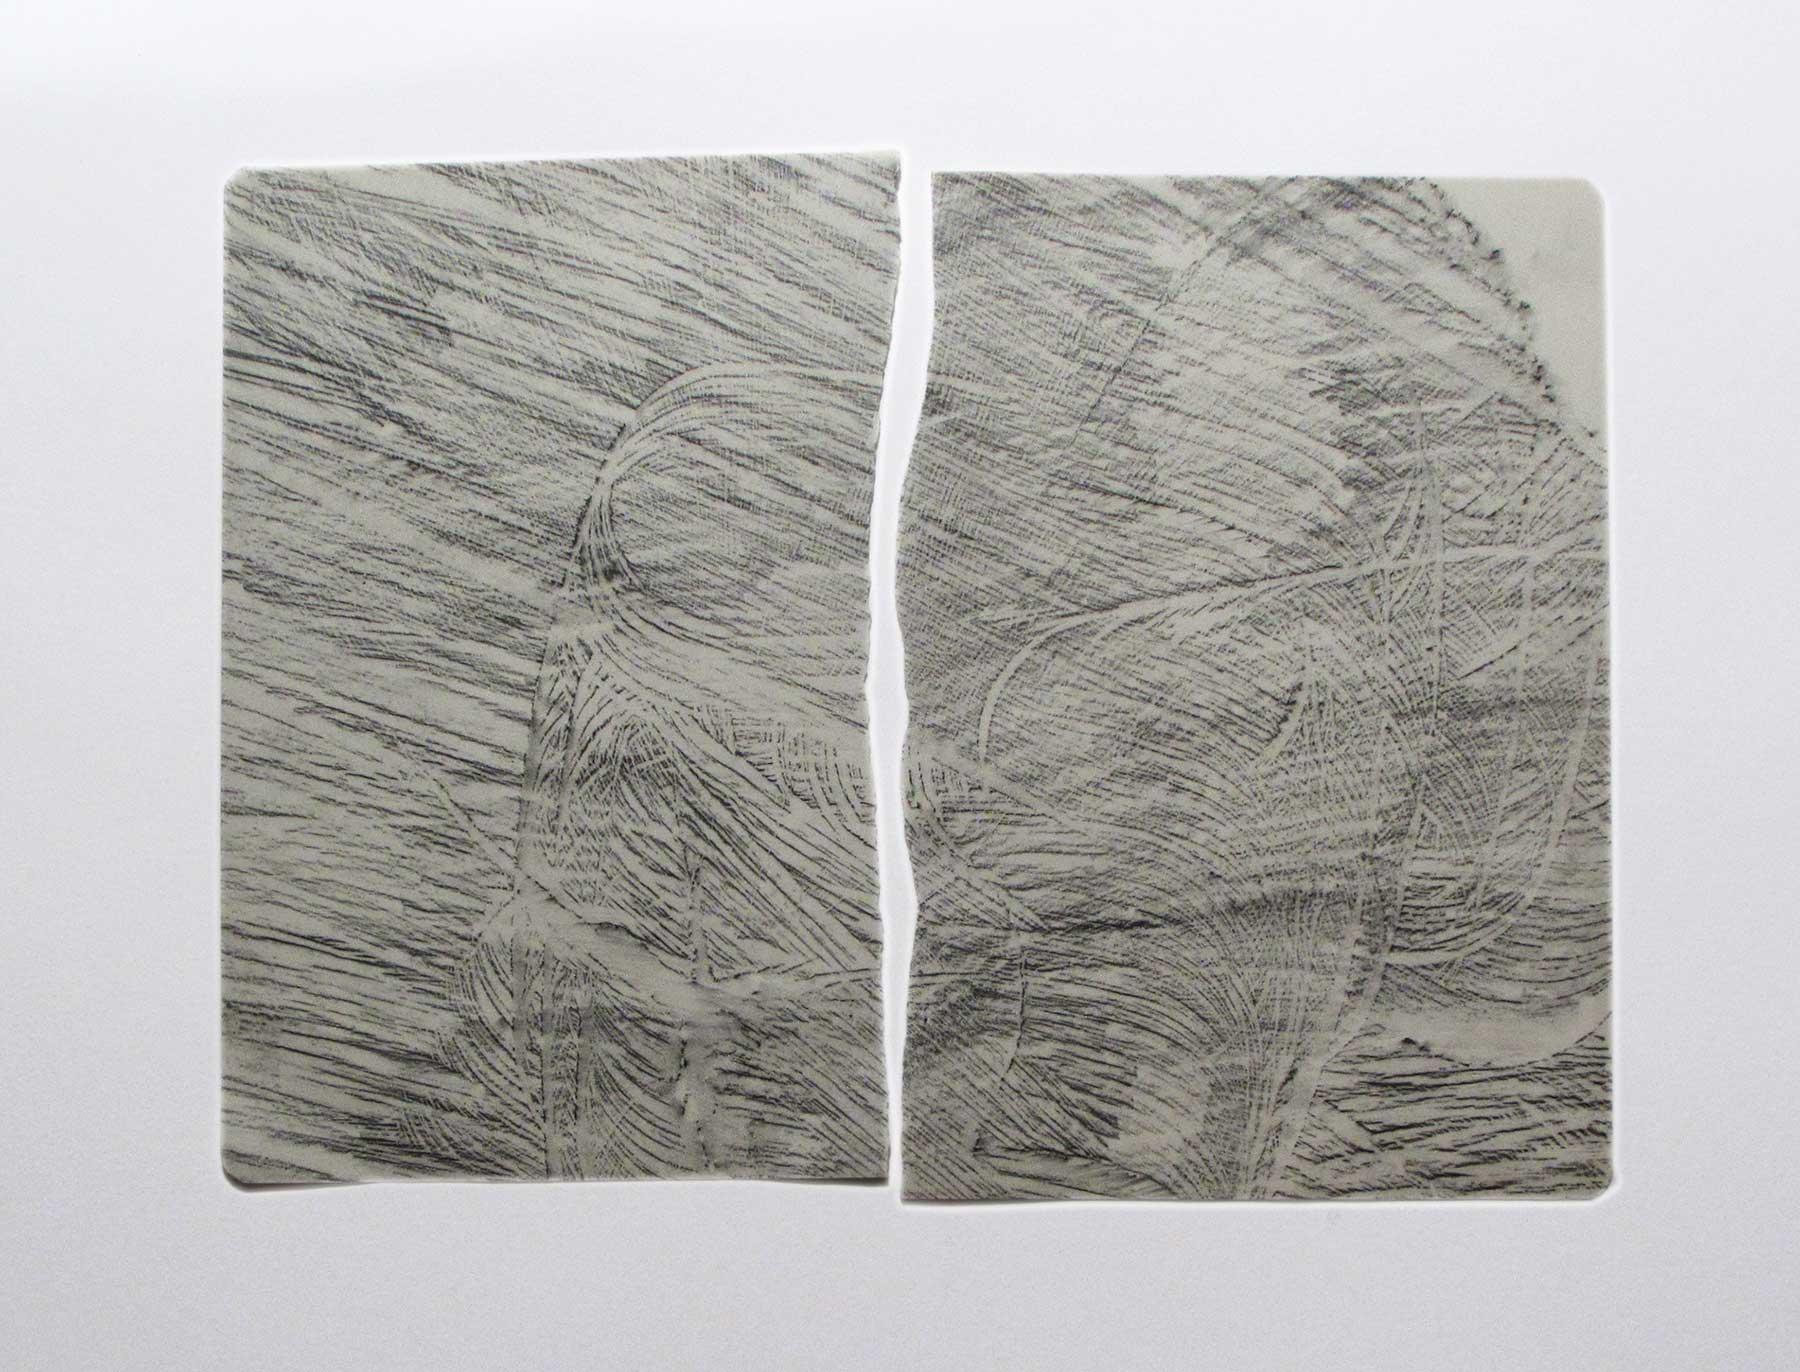 nicolapedana-Troisi-ricordo-II--2018-grafite-su-carta--40x30,5cm